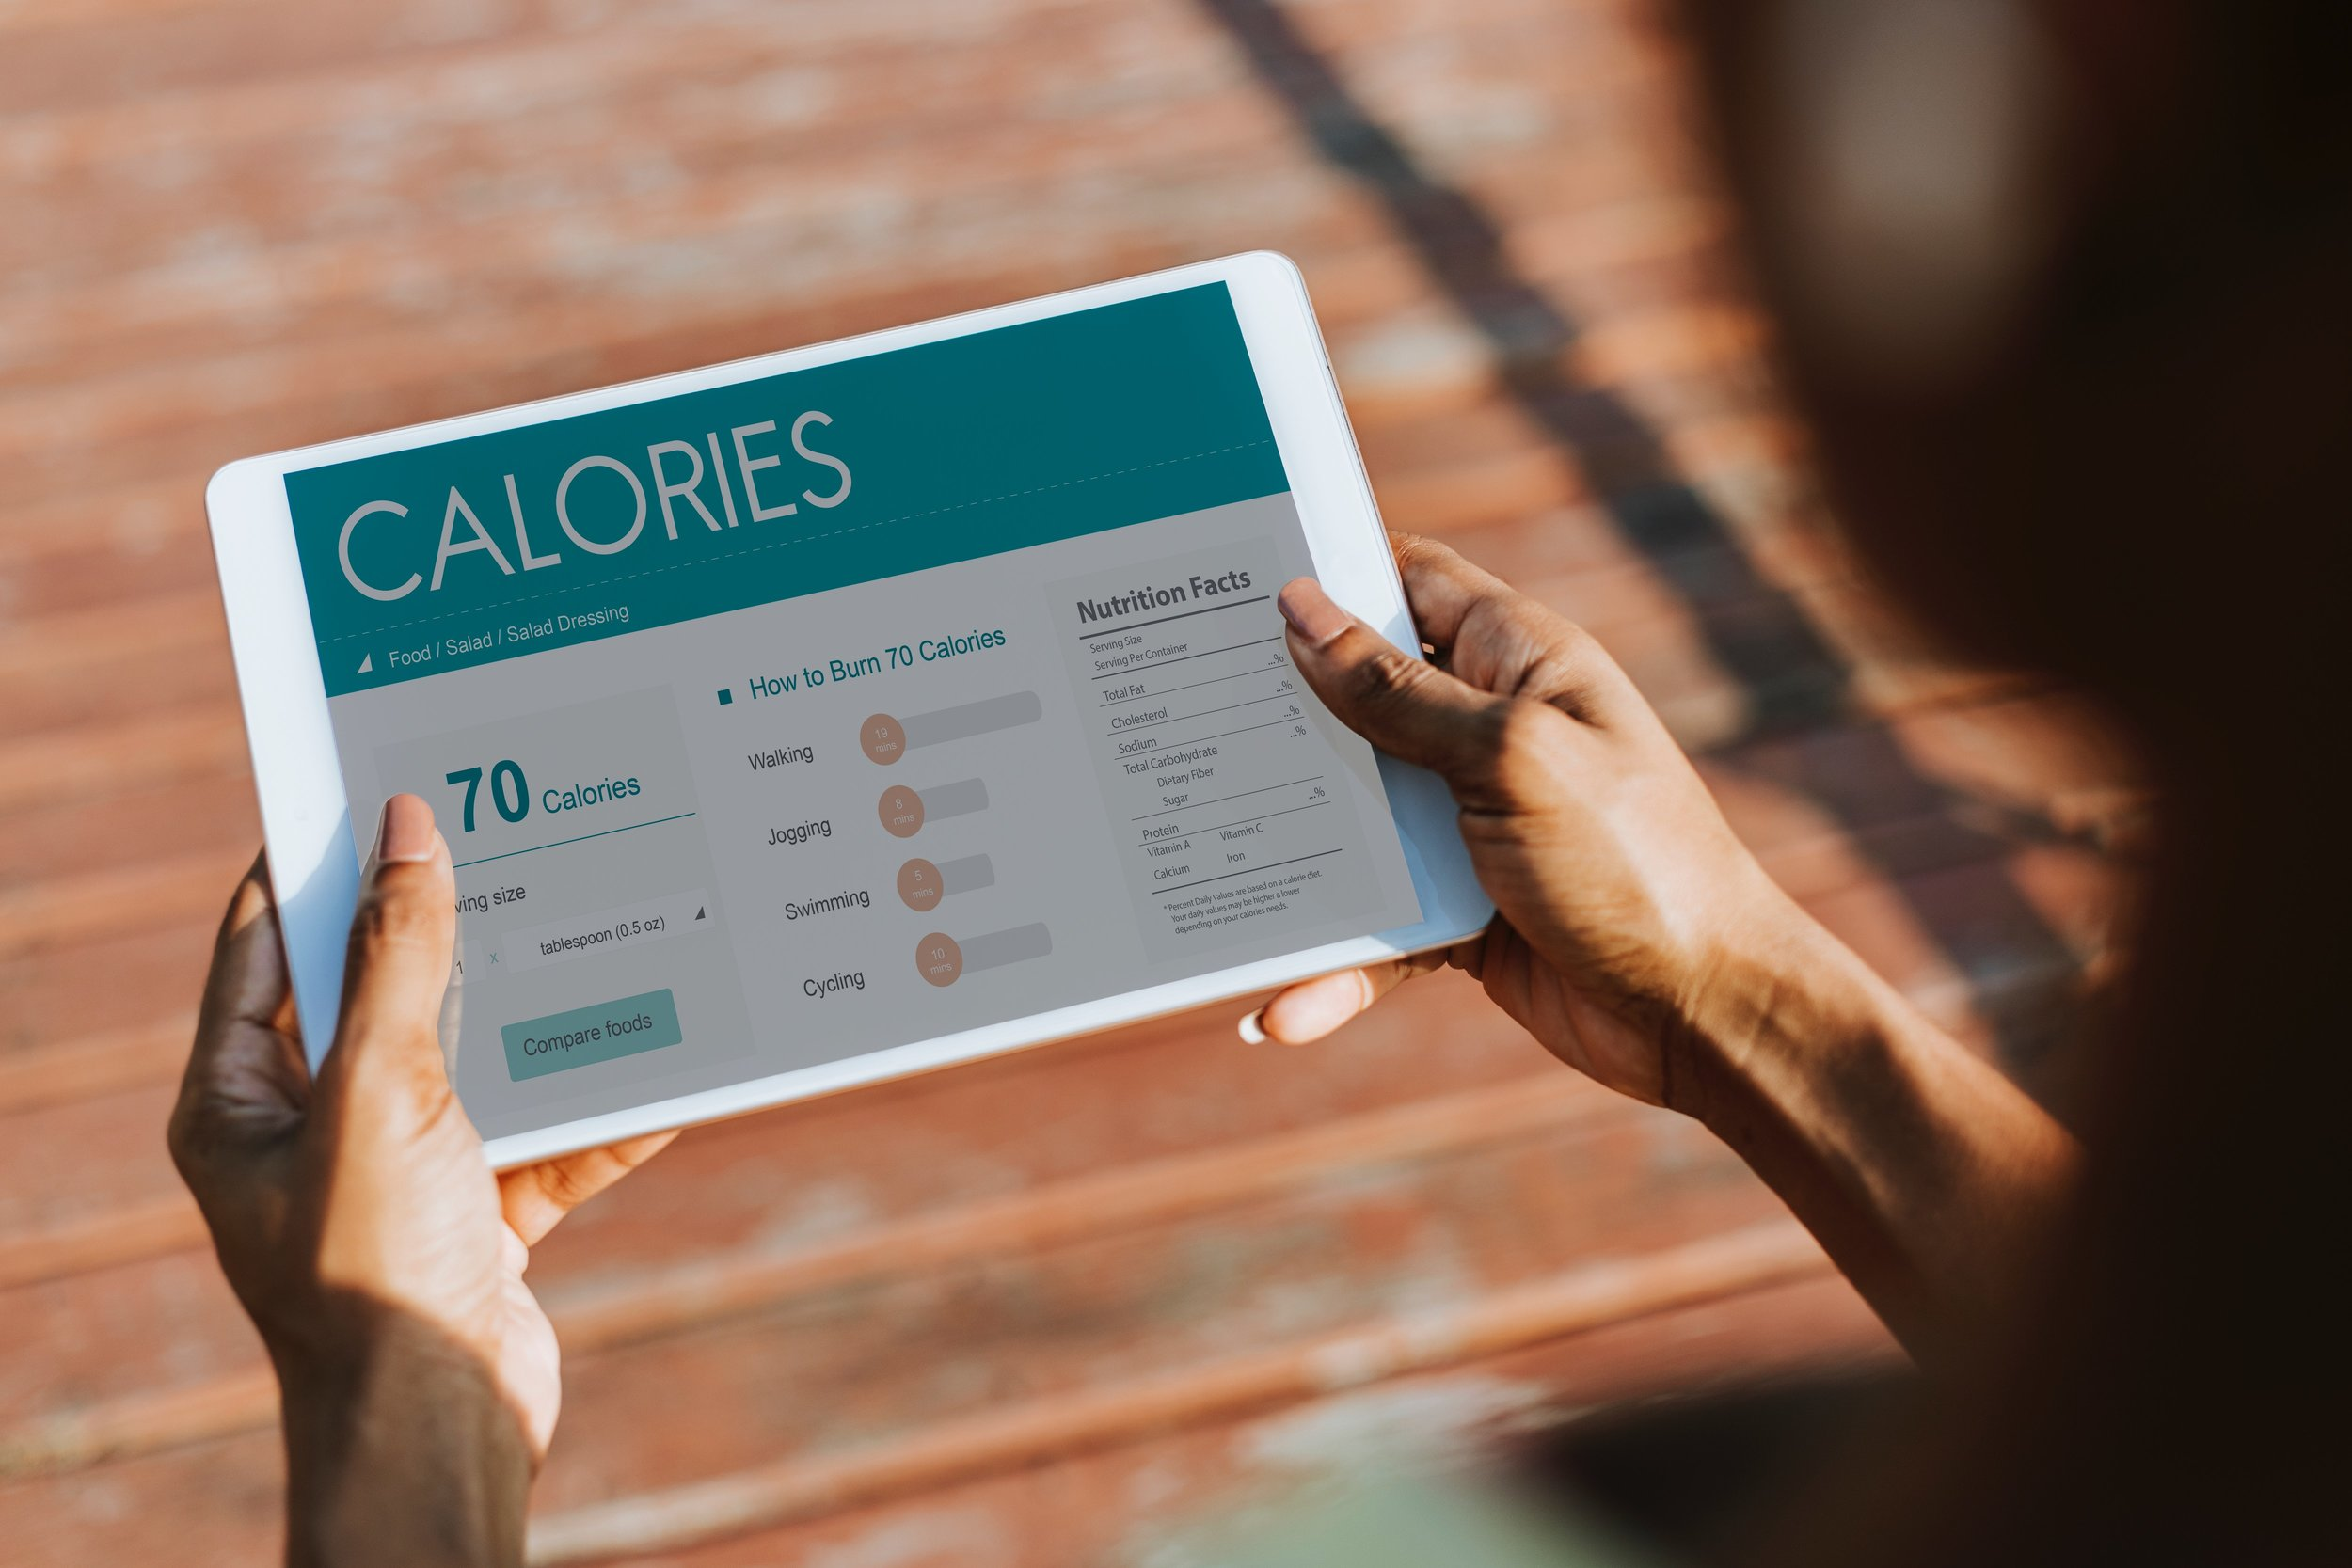 blur-calorie-intake-calories-1927500 (1).jpg